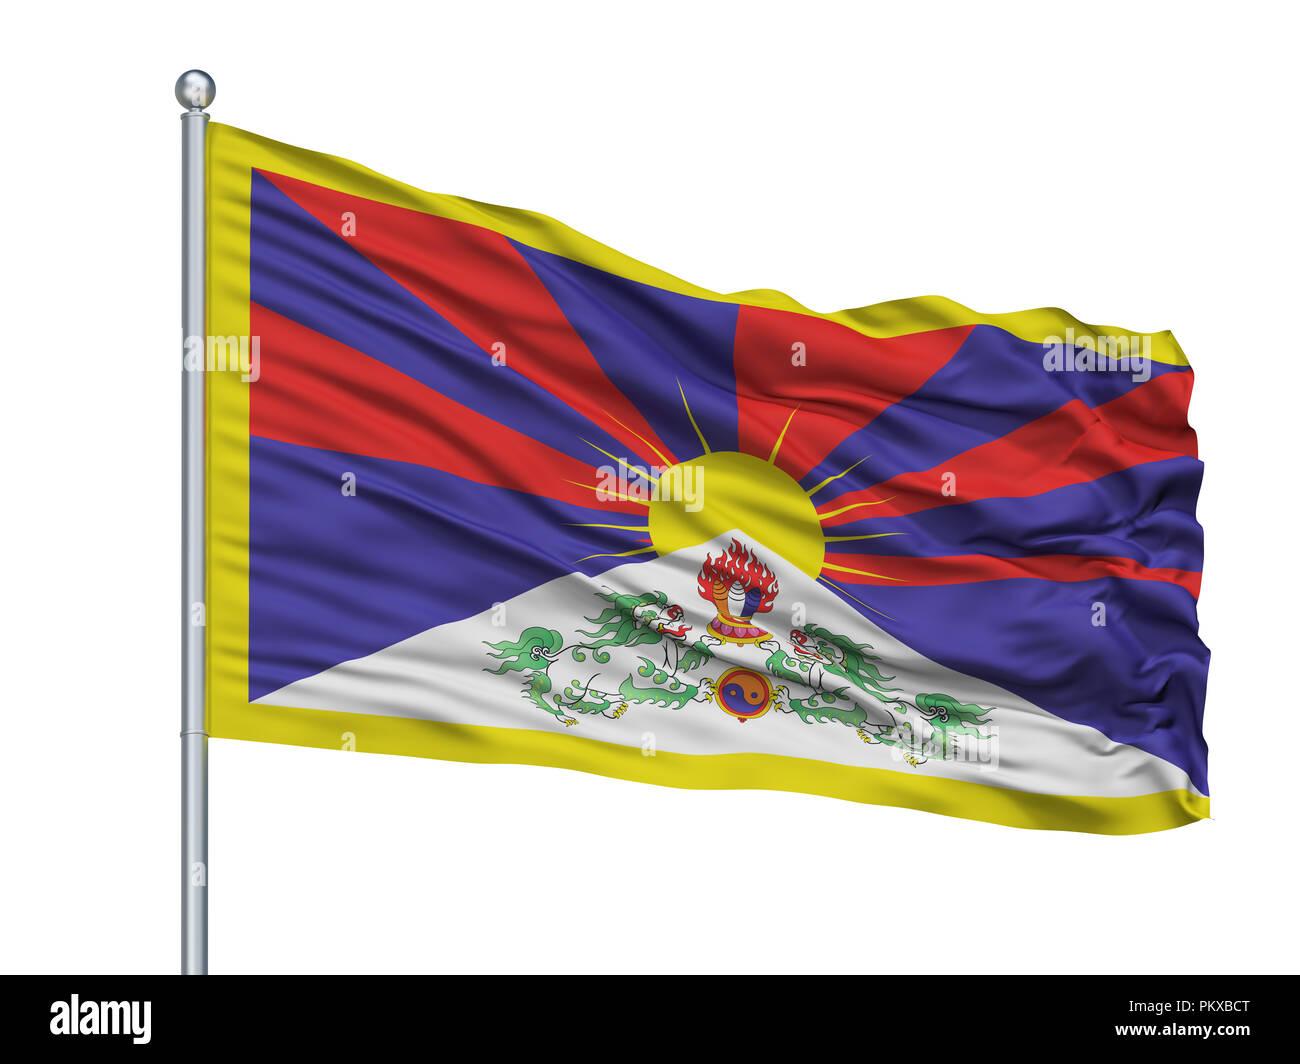 Tibet Flag On Flagpole, Isolated On White Background, 3D Rendering - Stock Image